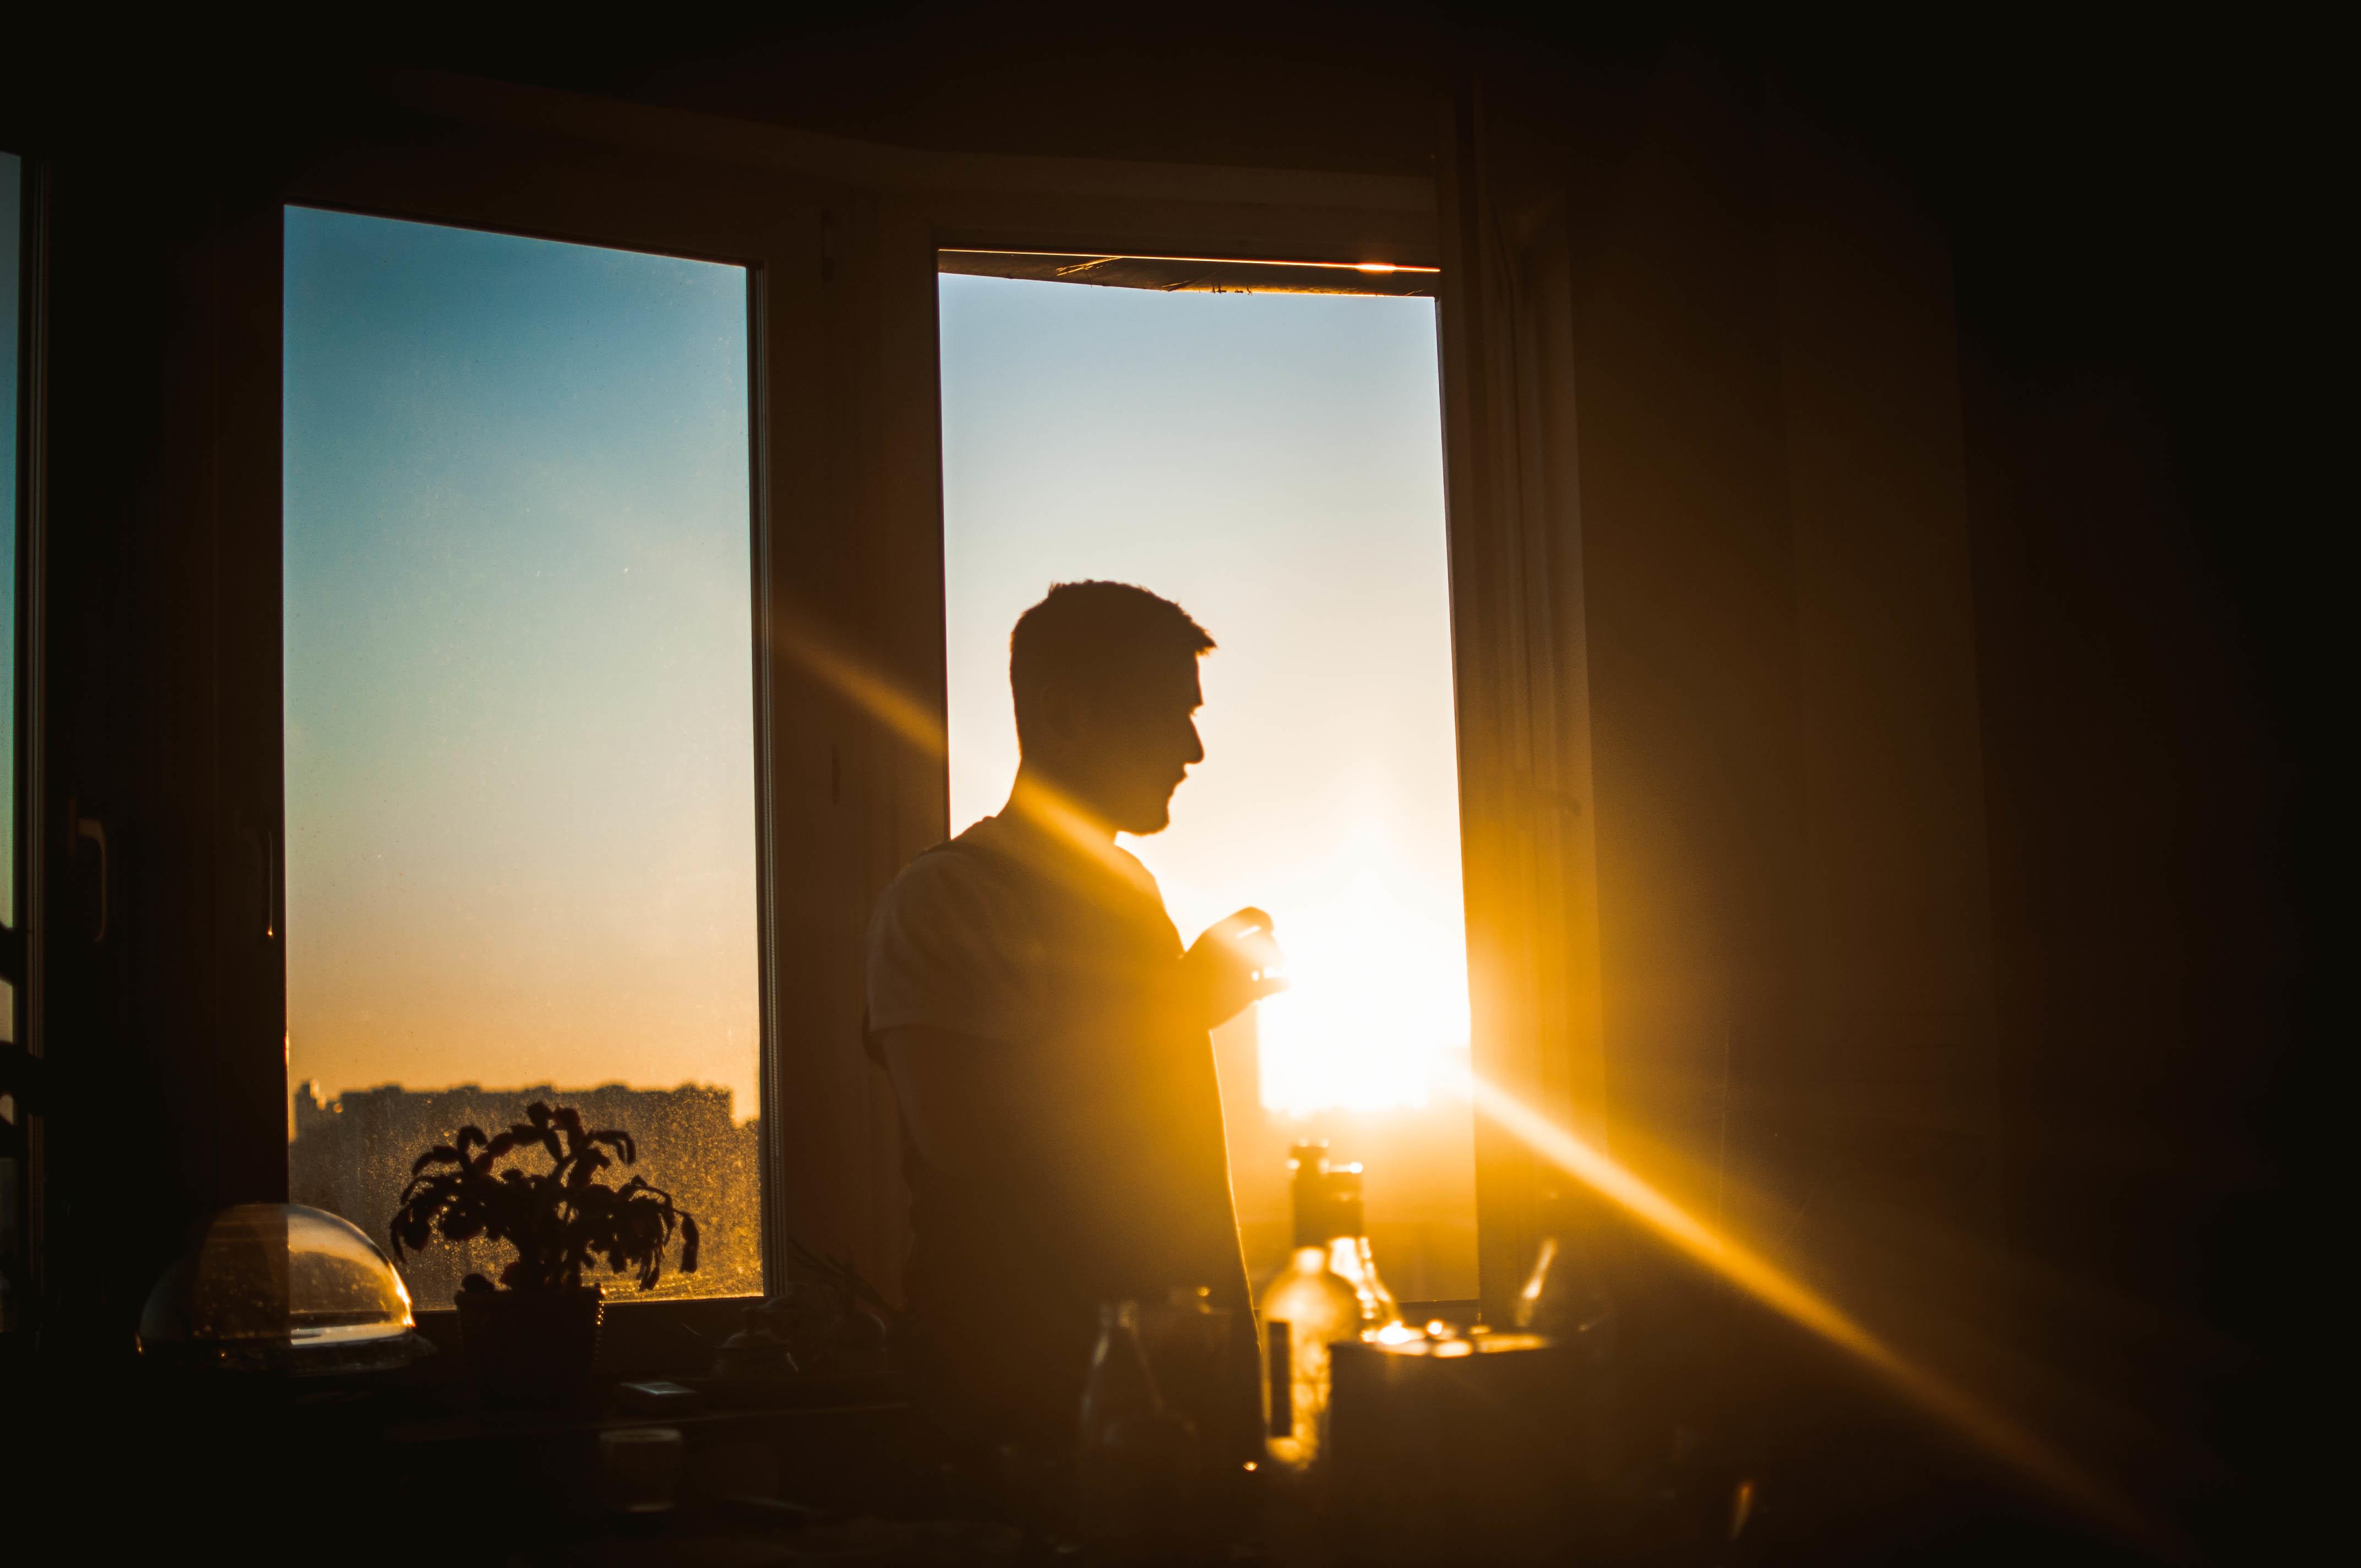 разу фото мужчина на стаканом ночь окнам москва рекомендую